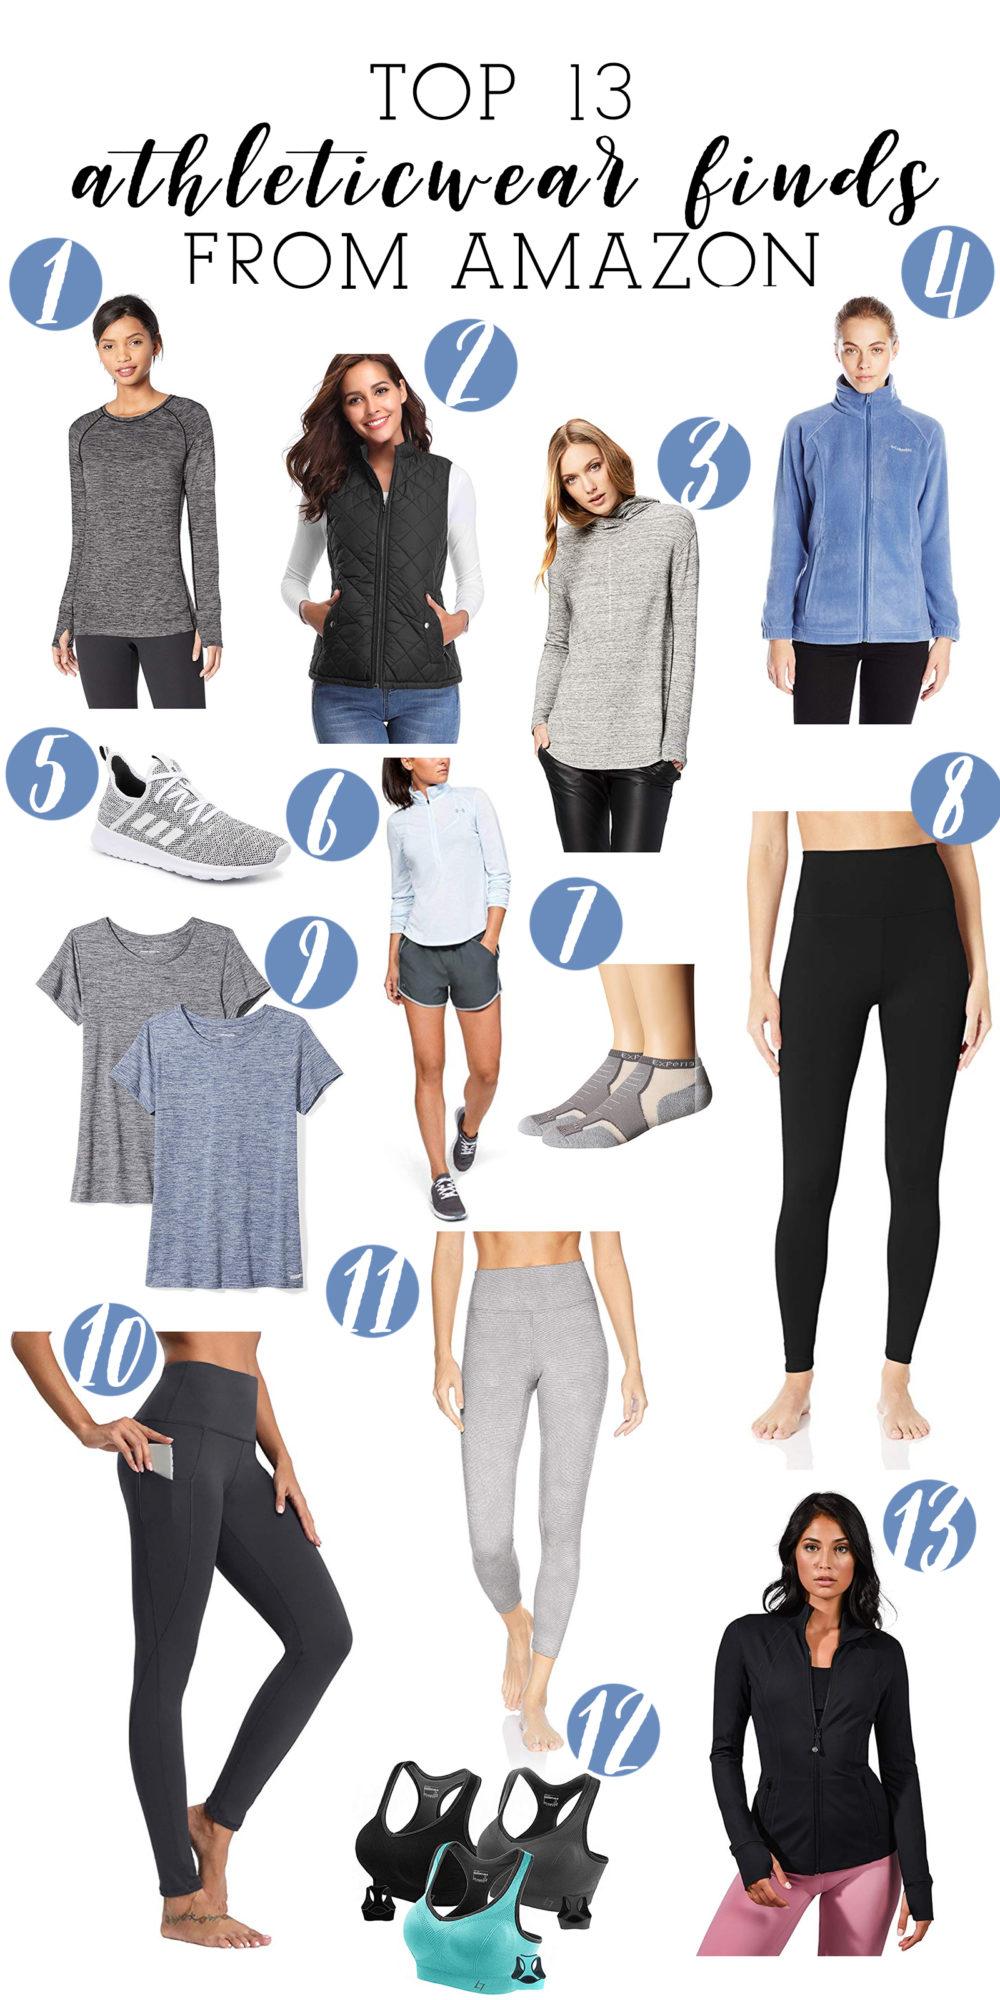 Petite Fashion Blog | Amazon Core 10 Leggings | Amazon Essentials Stripe Pullover | Amazon Women's Leggings | Puffer Vest | Black Nike Sneakers | Hydroflask